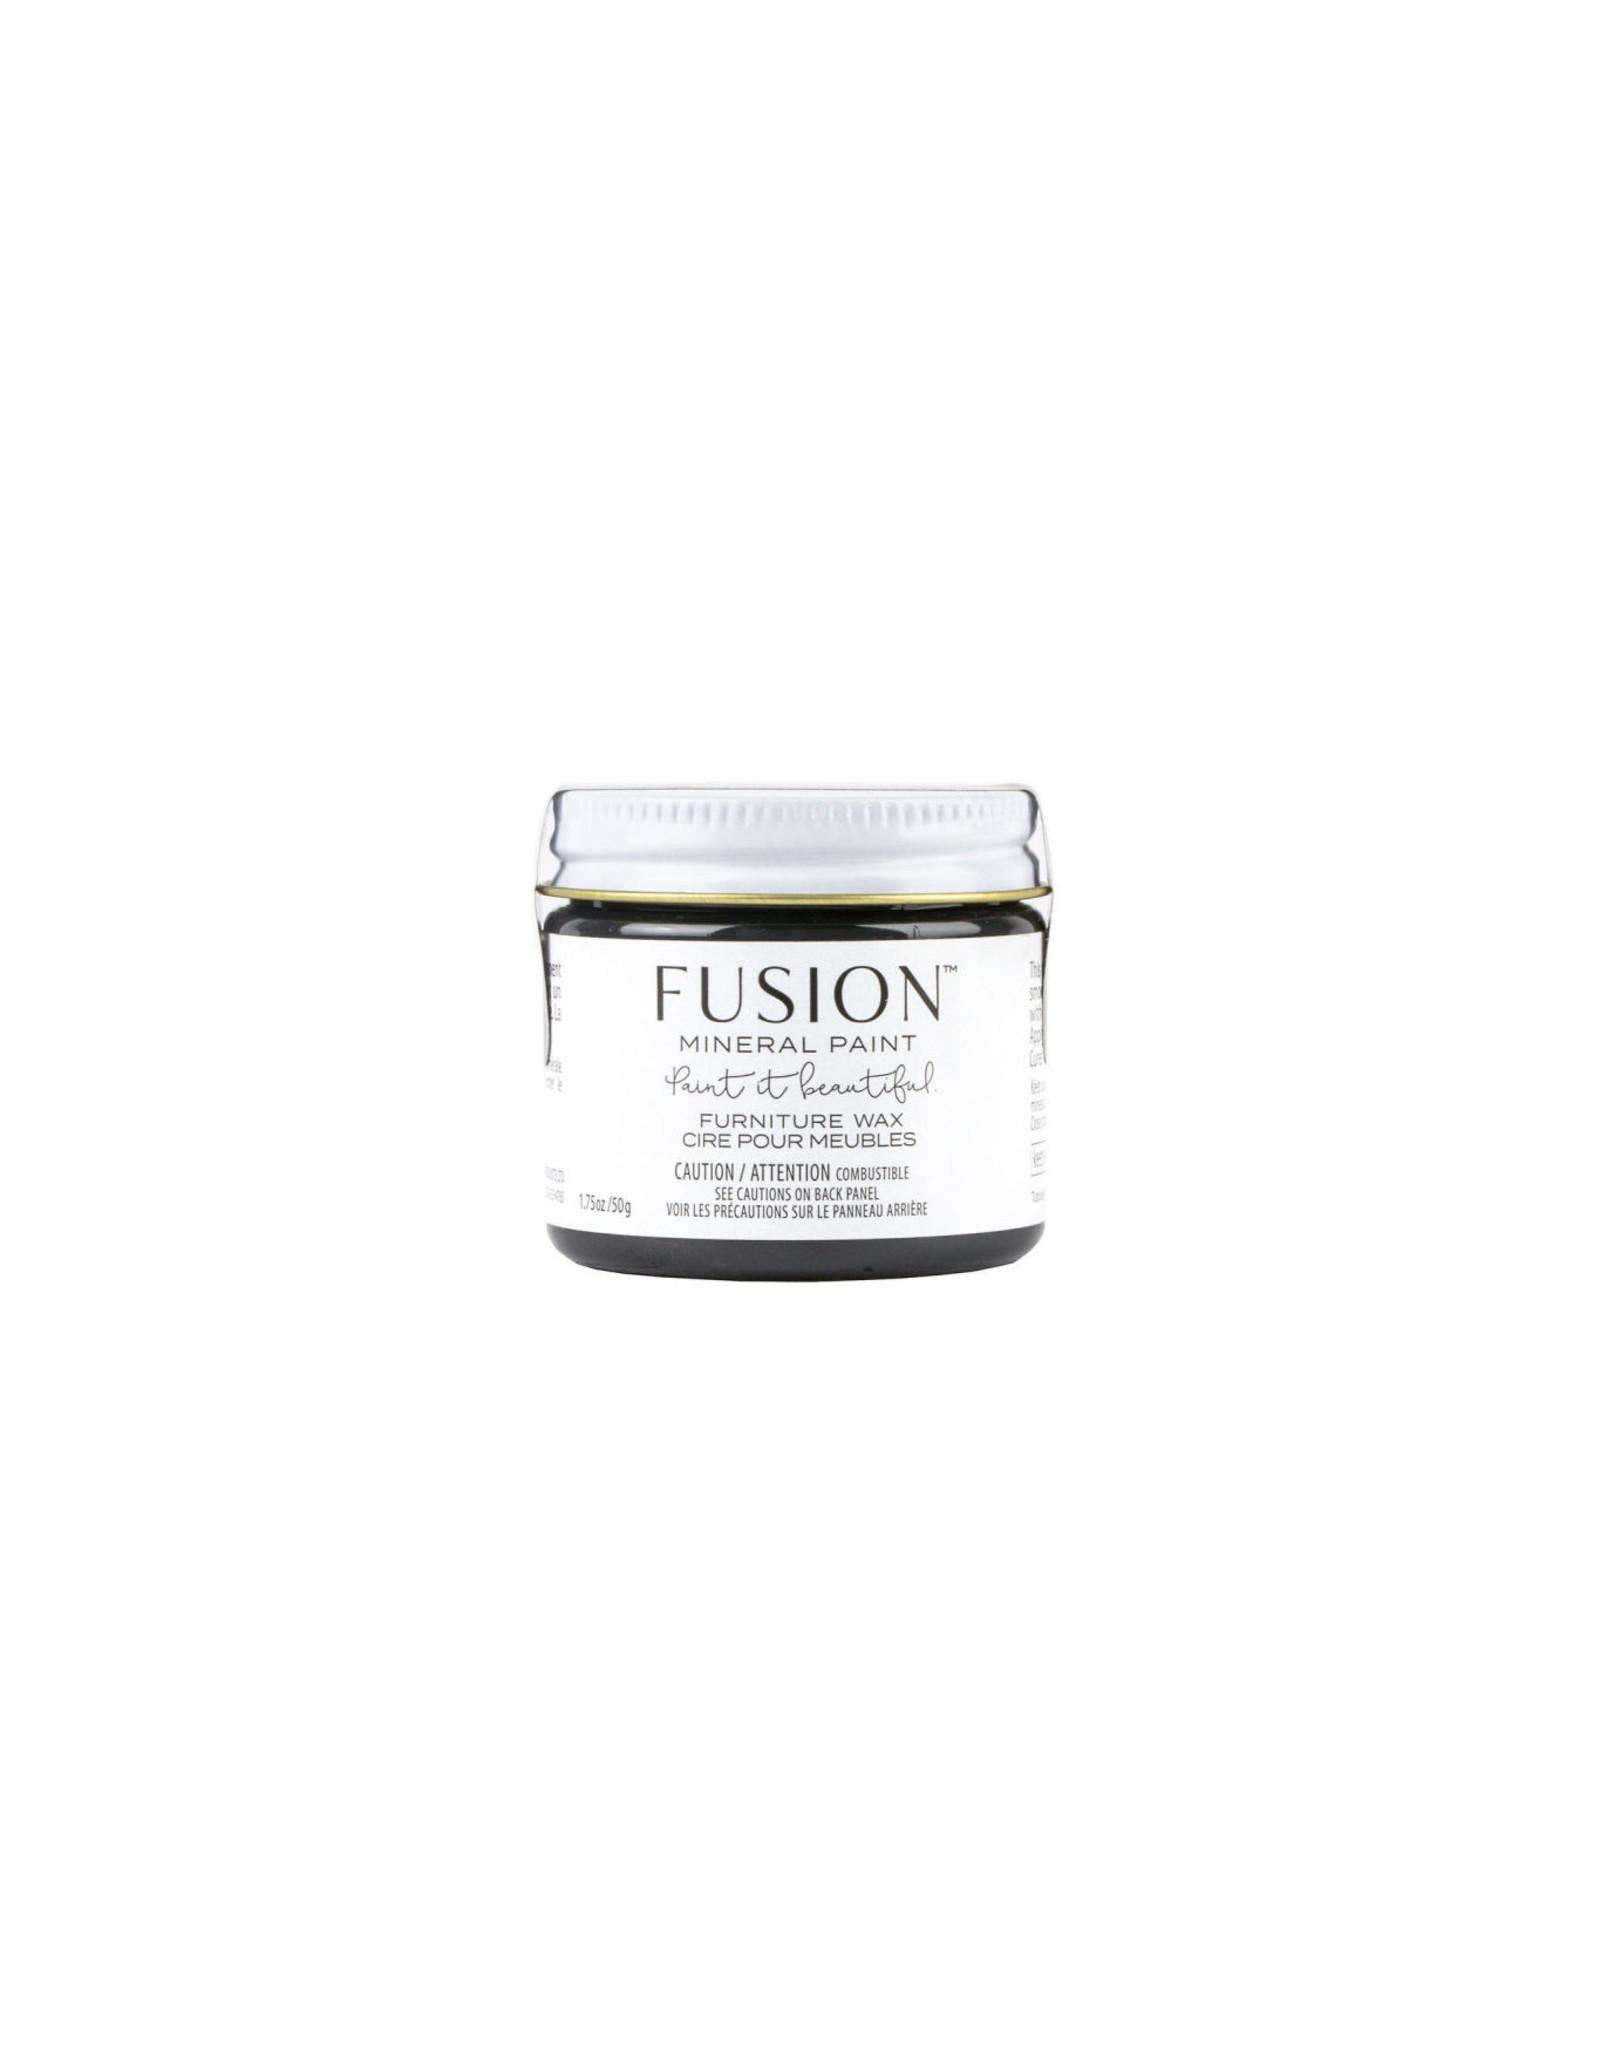 Fusion Mineral Paint Furniture Wax 50g - Black